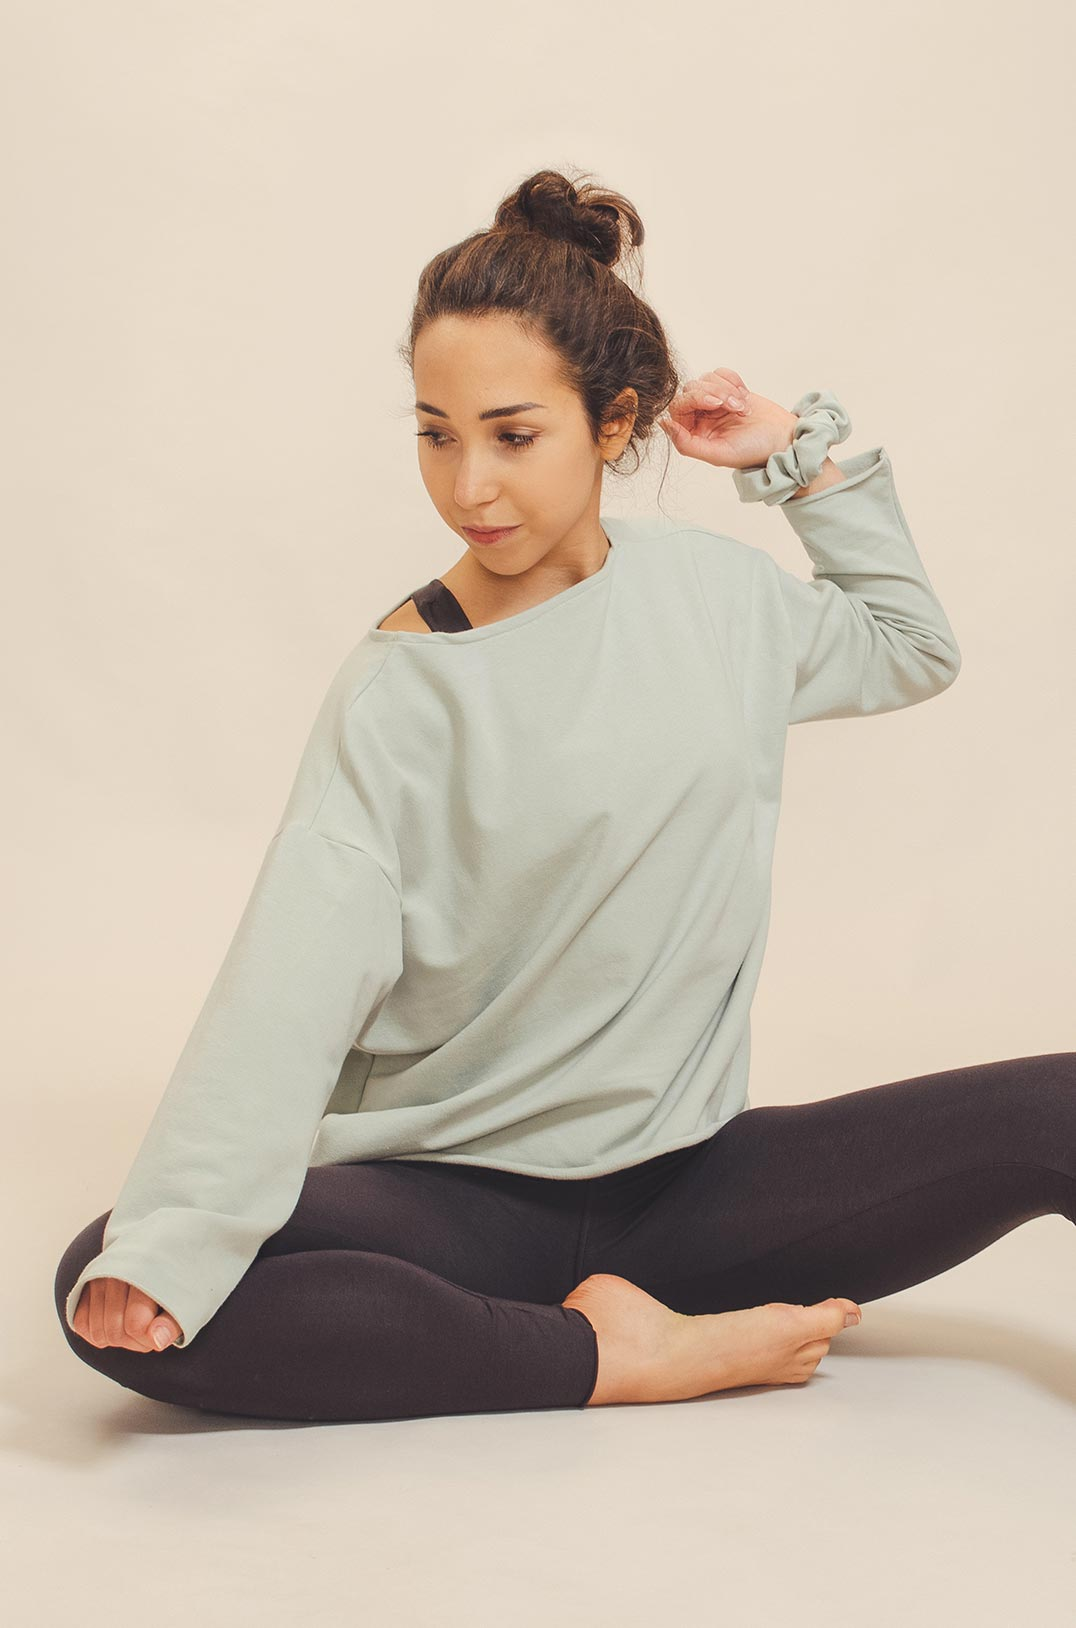 abbigliamento yoga consapevole made in italy atma feed your soul cotton felpa uma colore brina